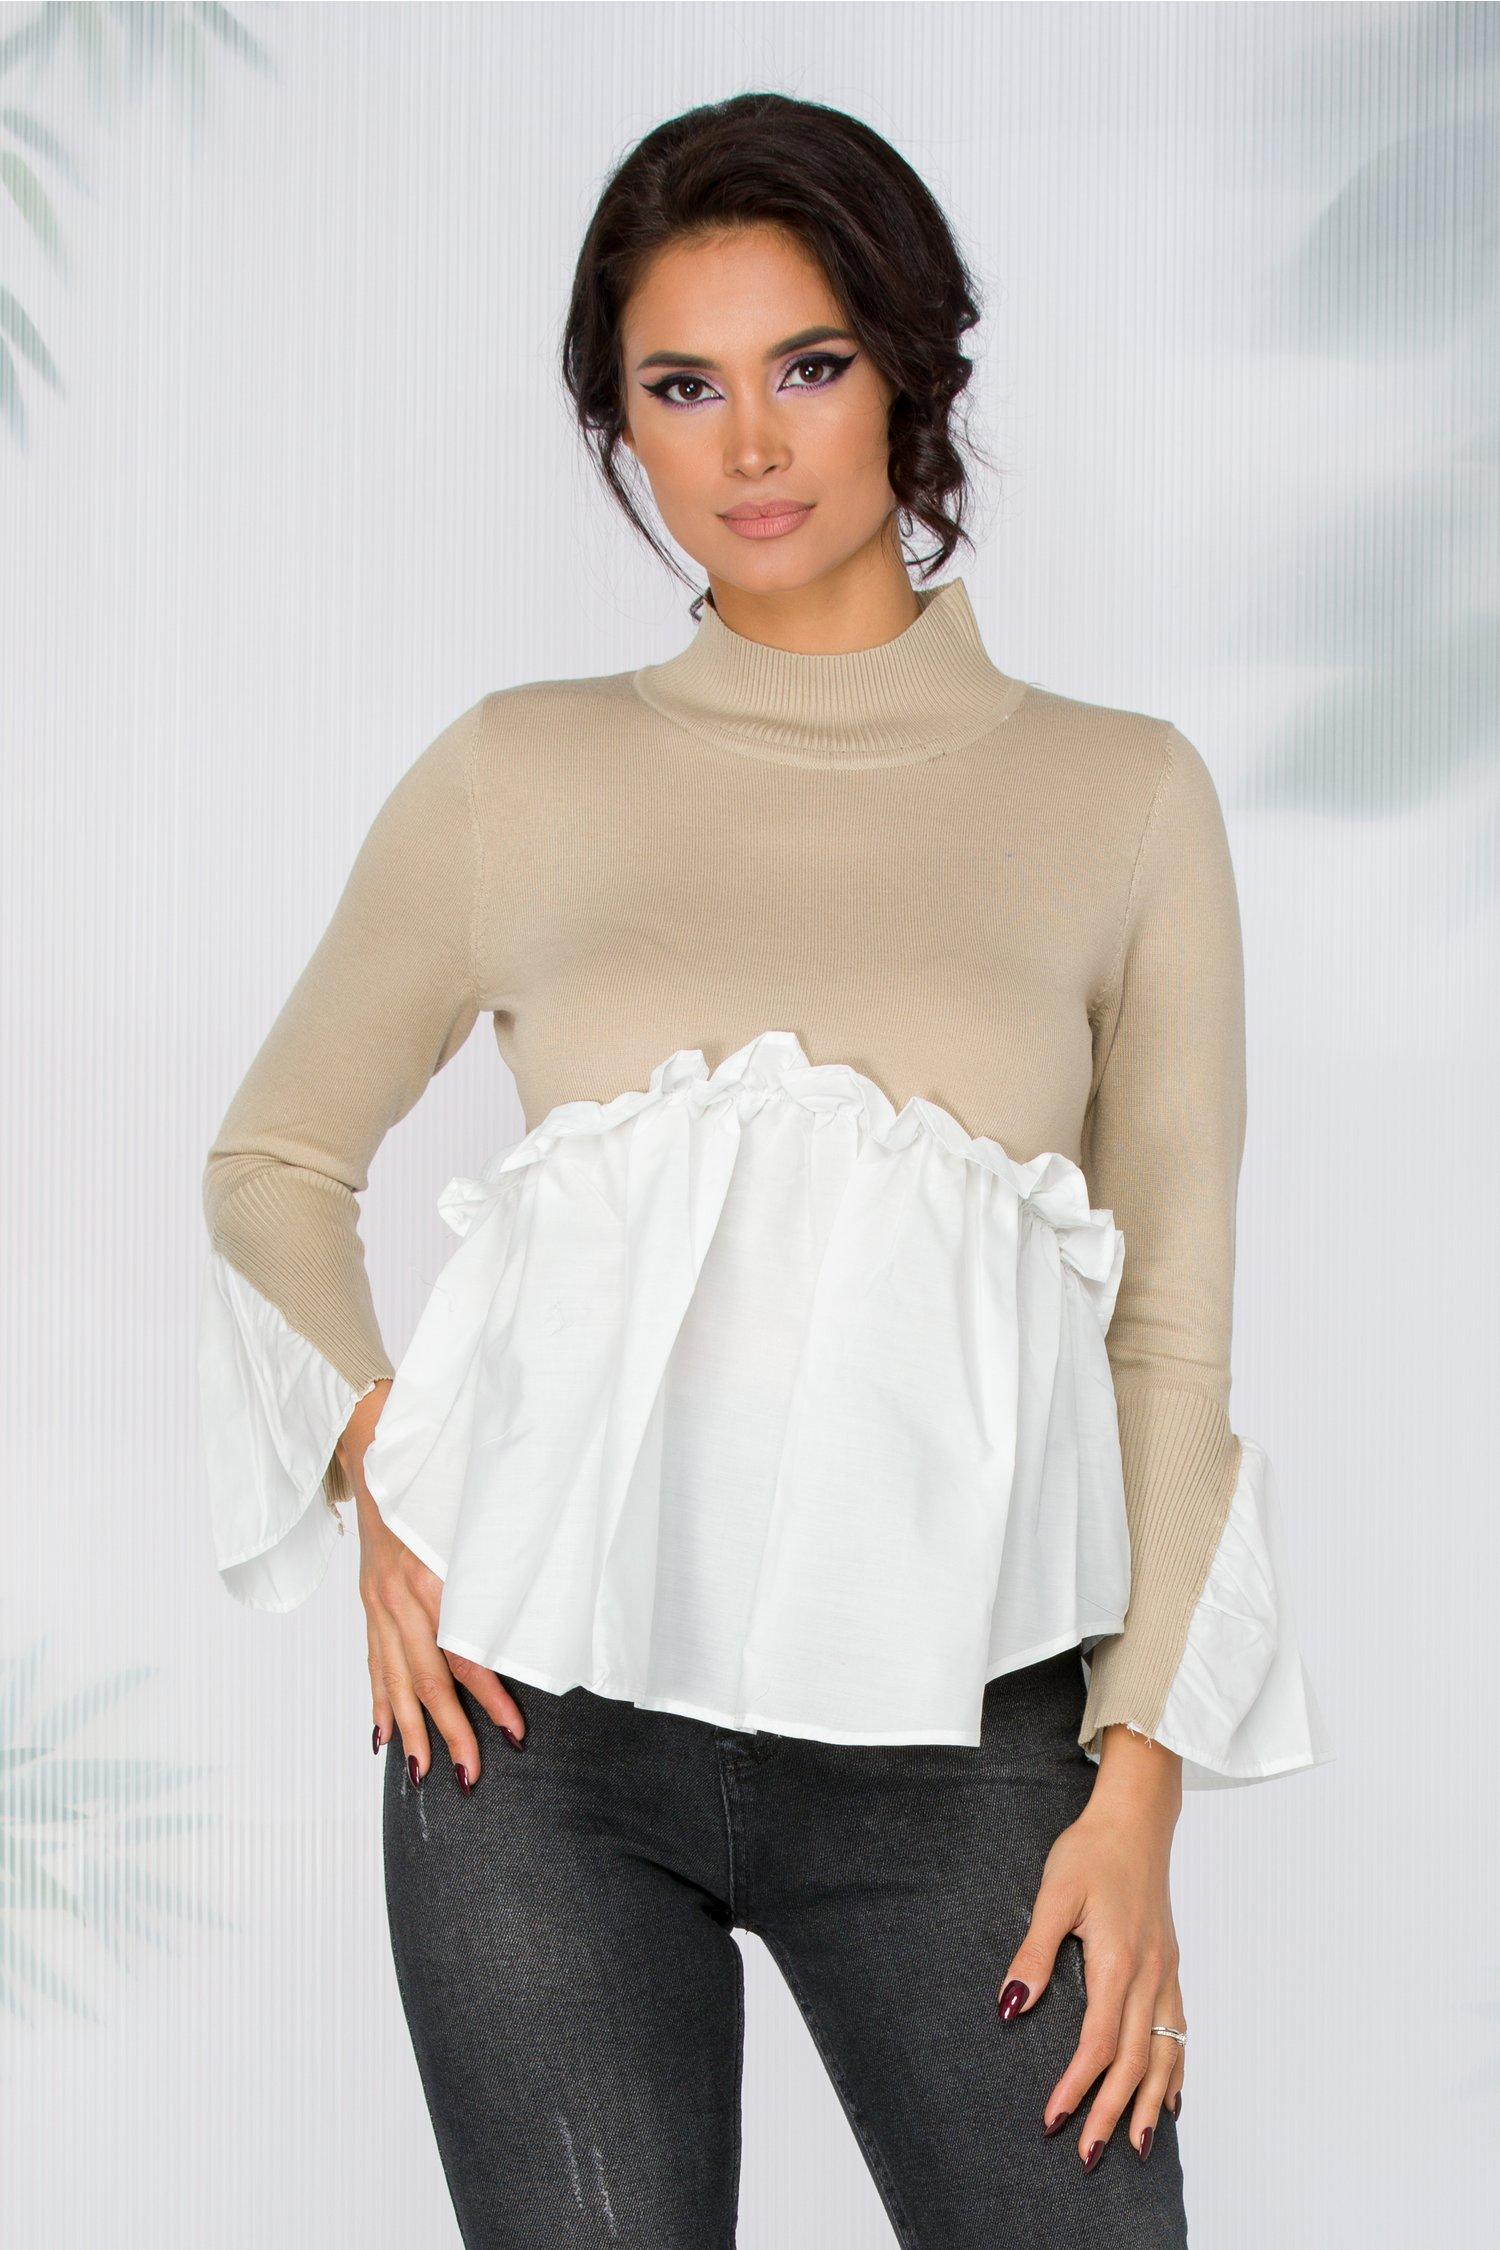 Bluza Jola bej tricot cu detalii de camasa